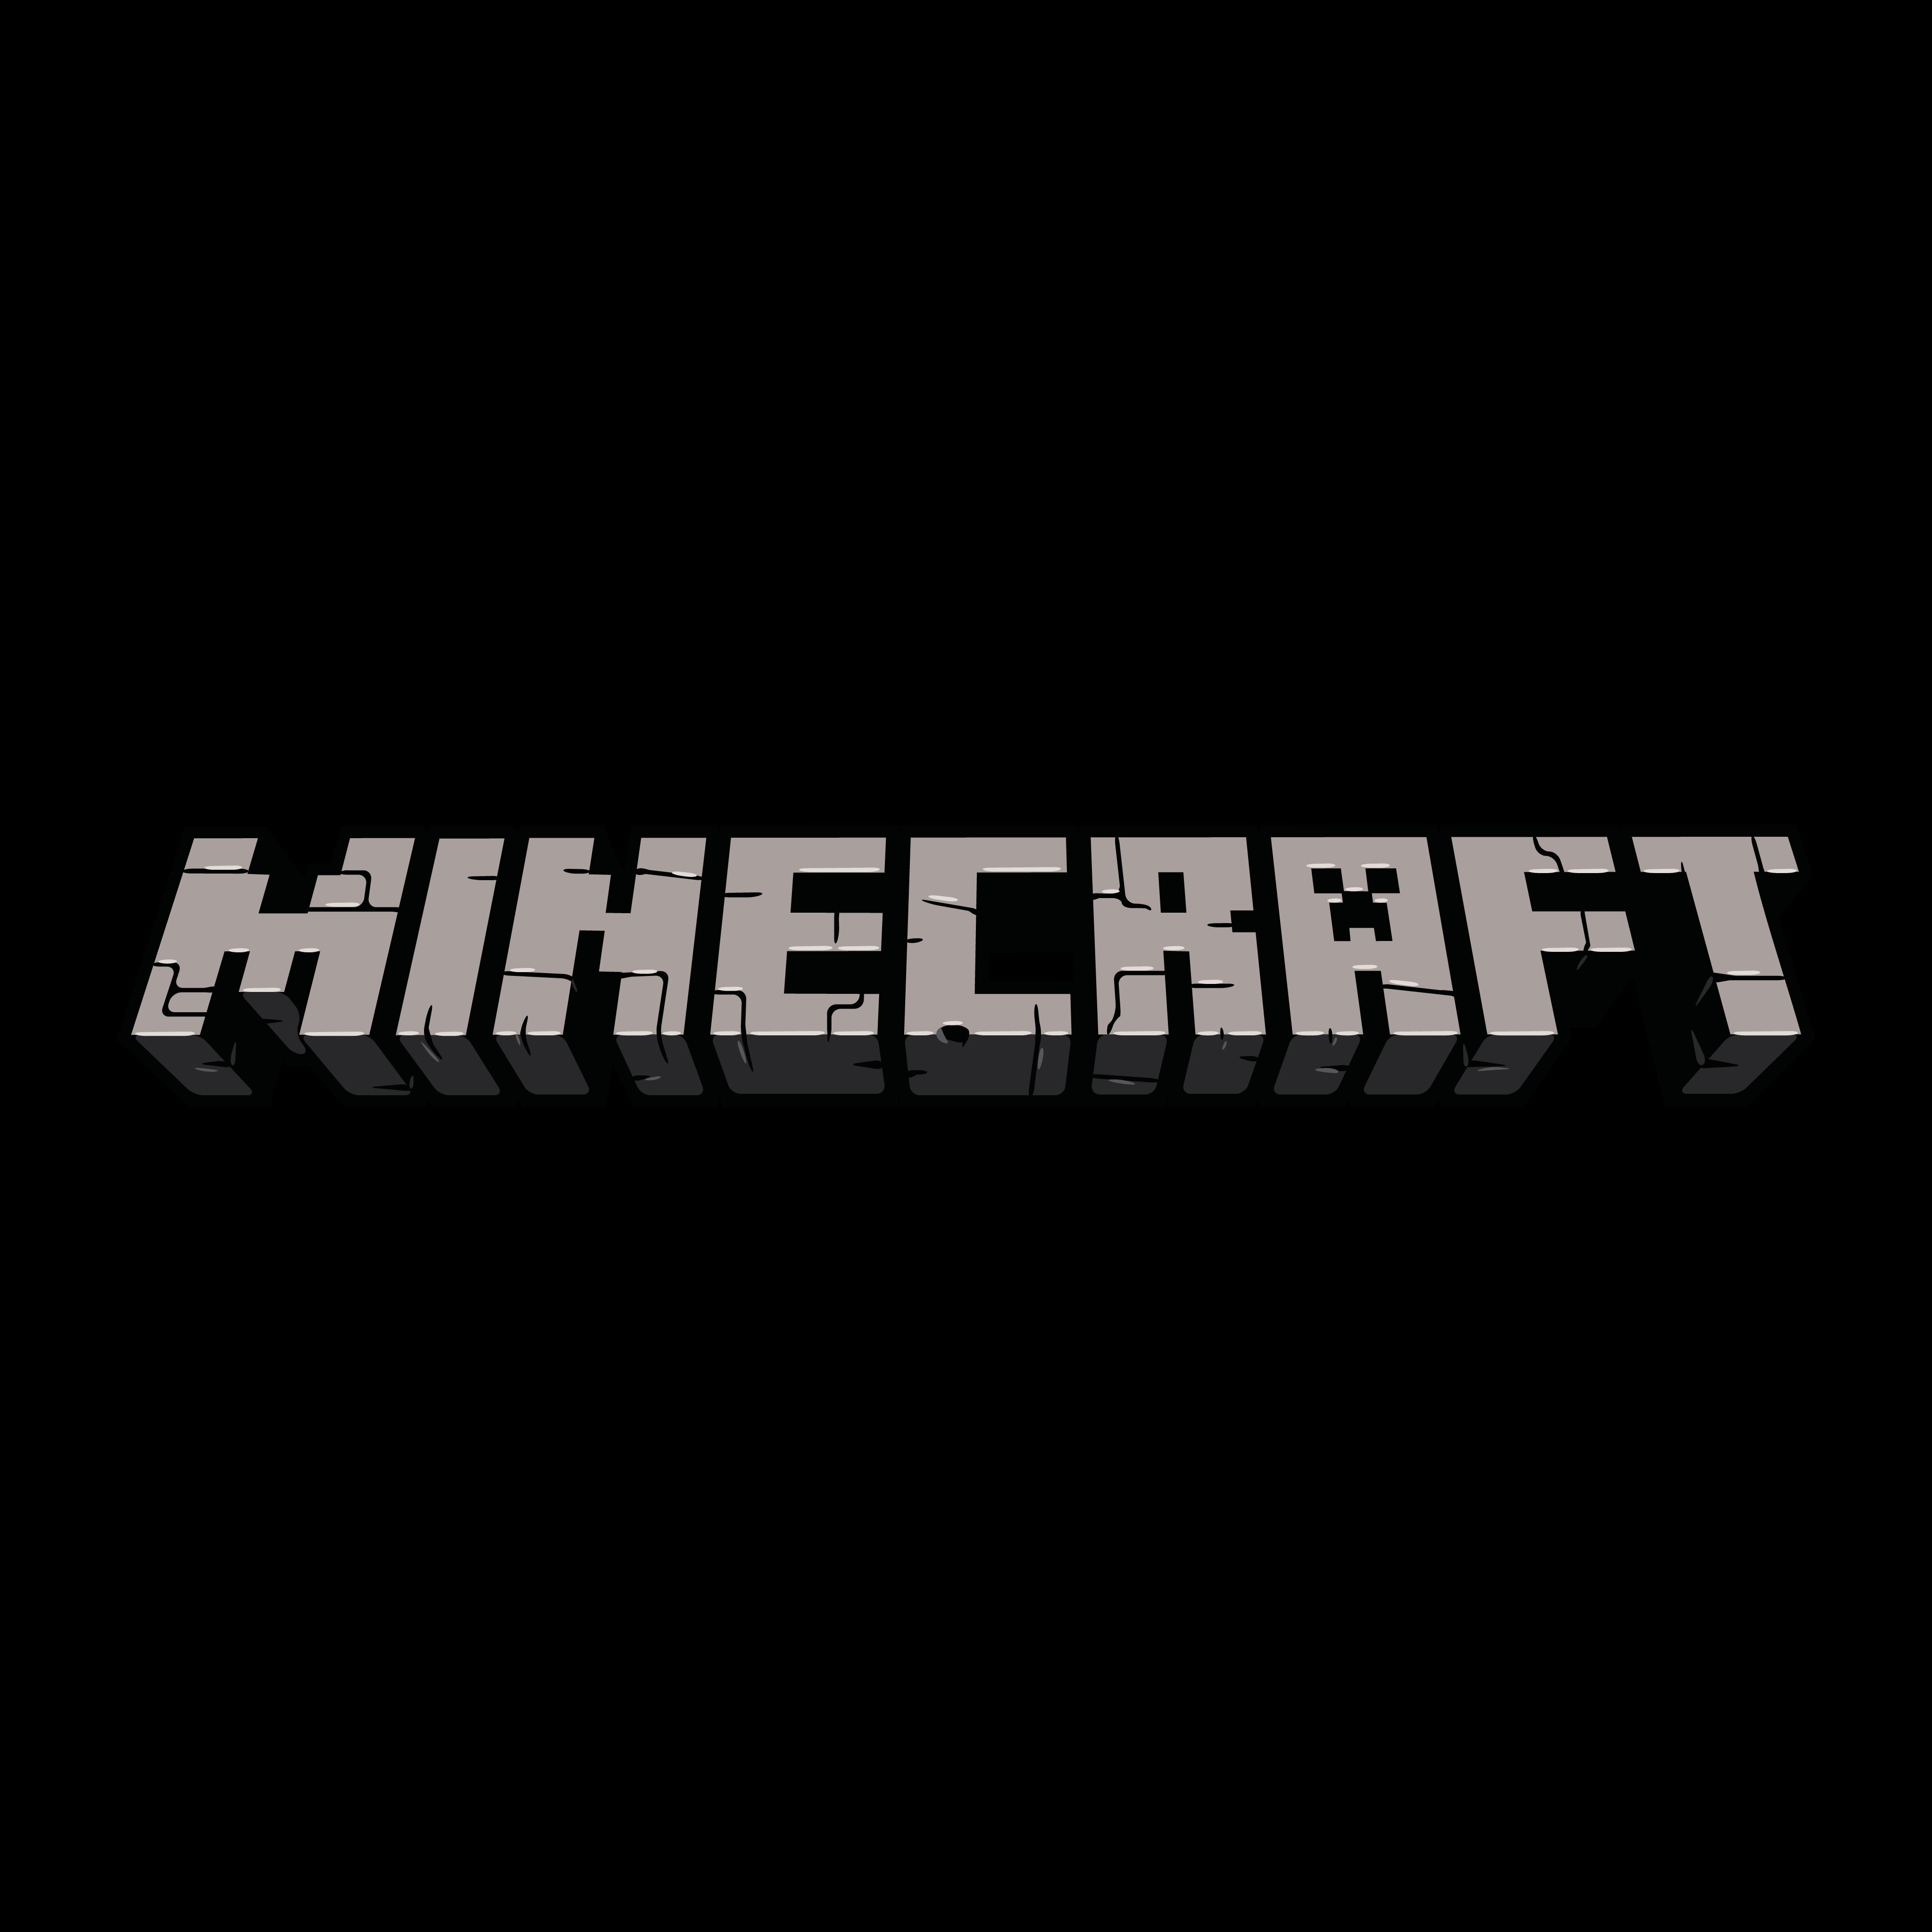 Logo Minecraft - Logos PNG